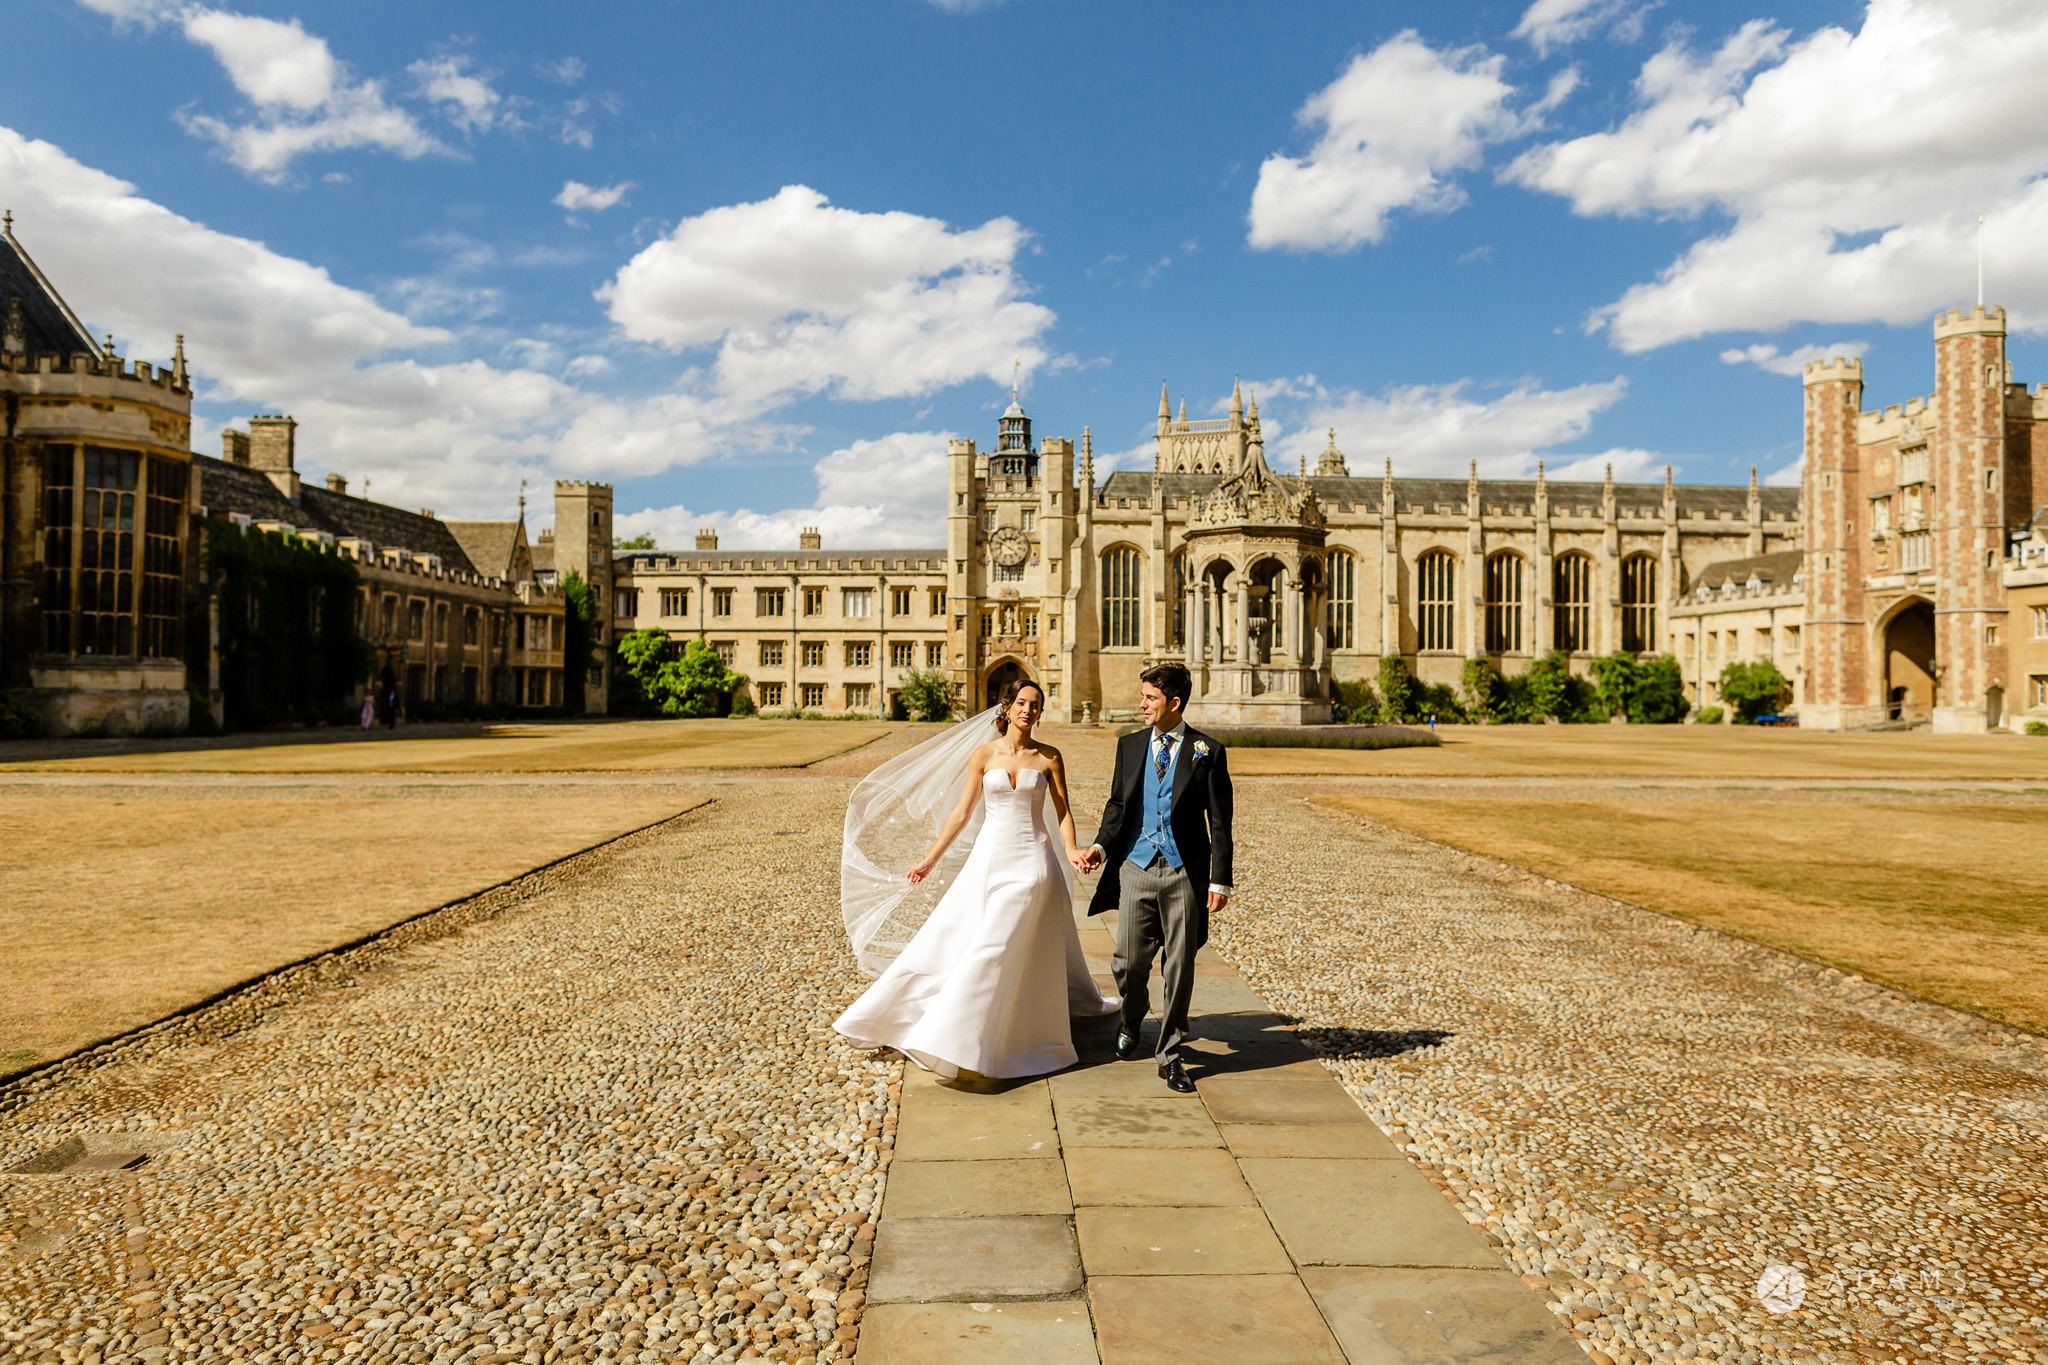 Trinity College Cambridge wedding couple walking in the university courtyard